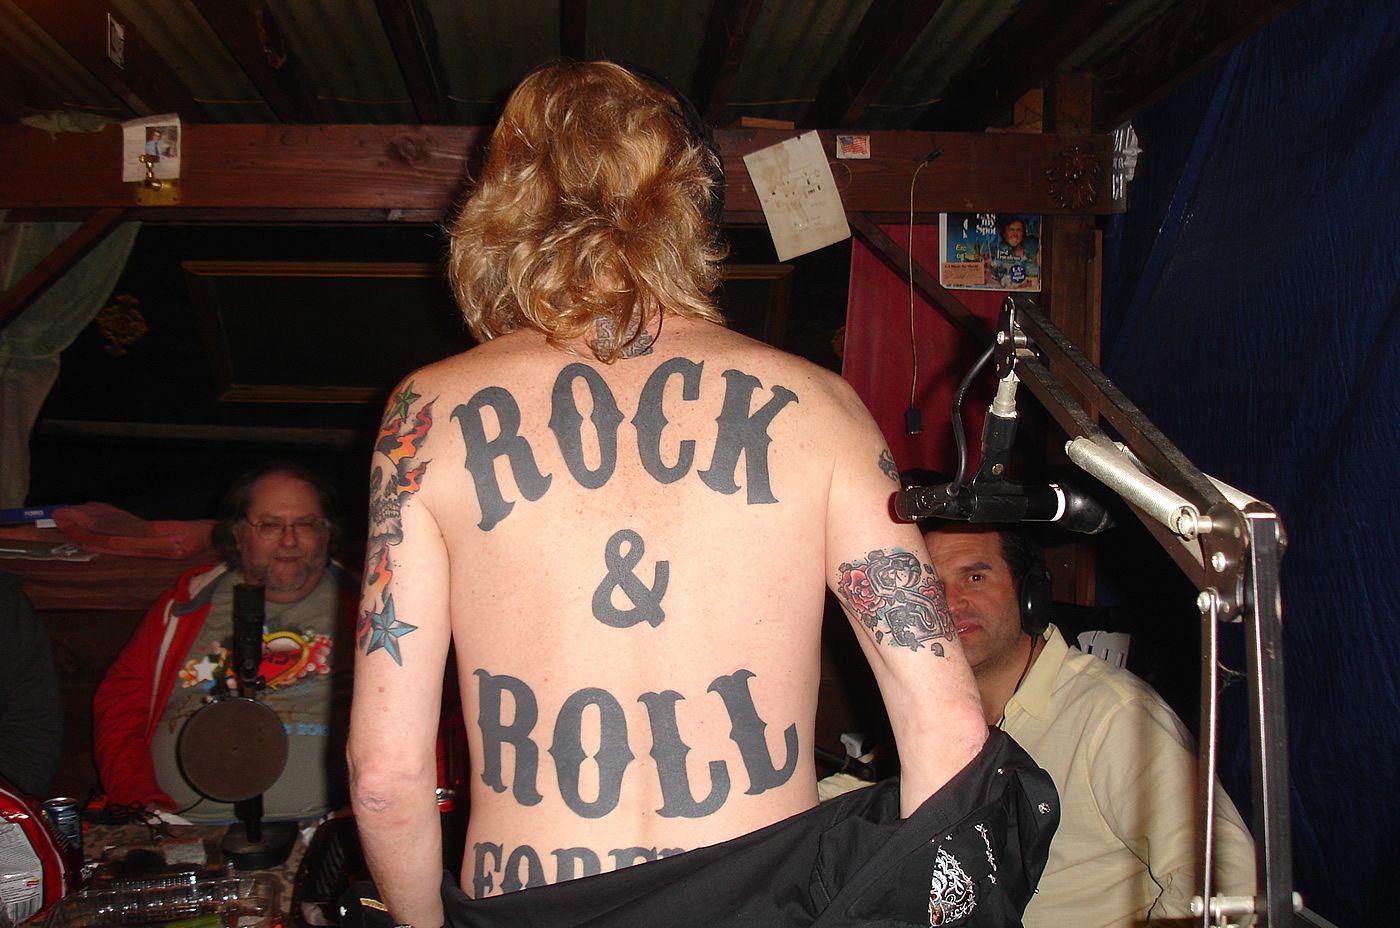 The animals band logo scorpions band logo - James Kottak Of Rock Band Scorpions